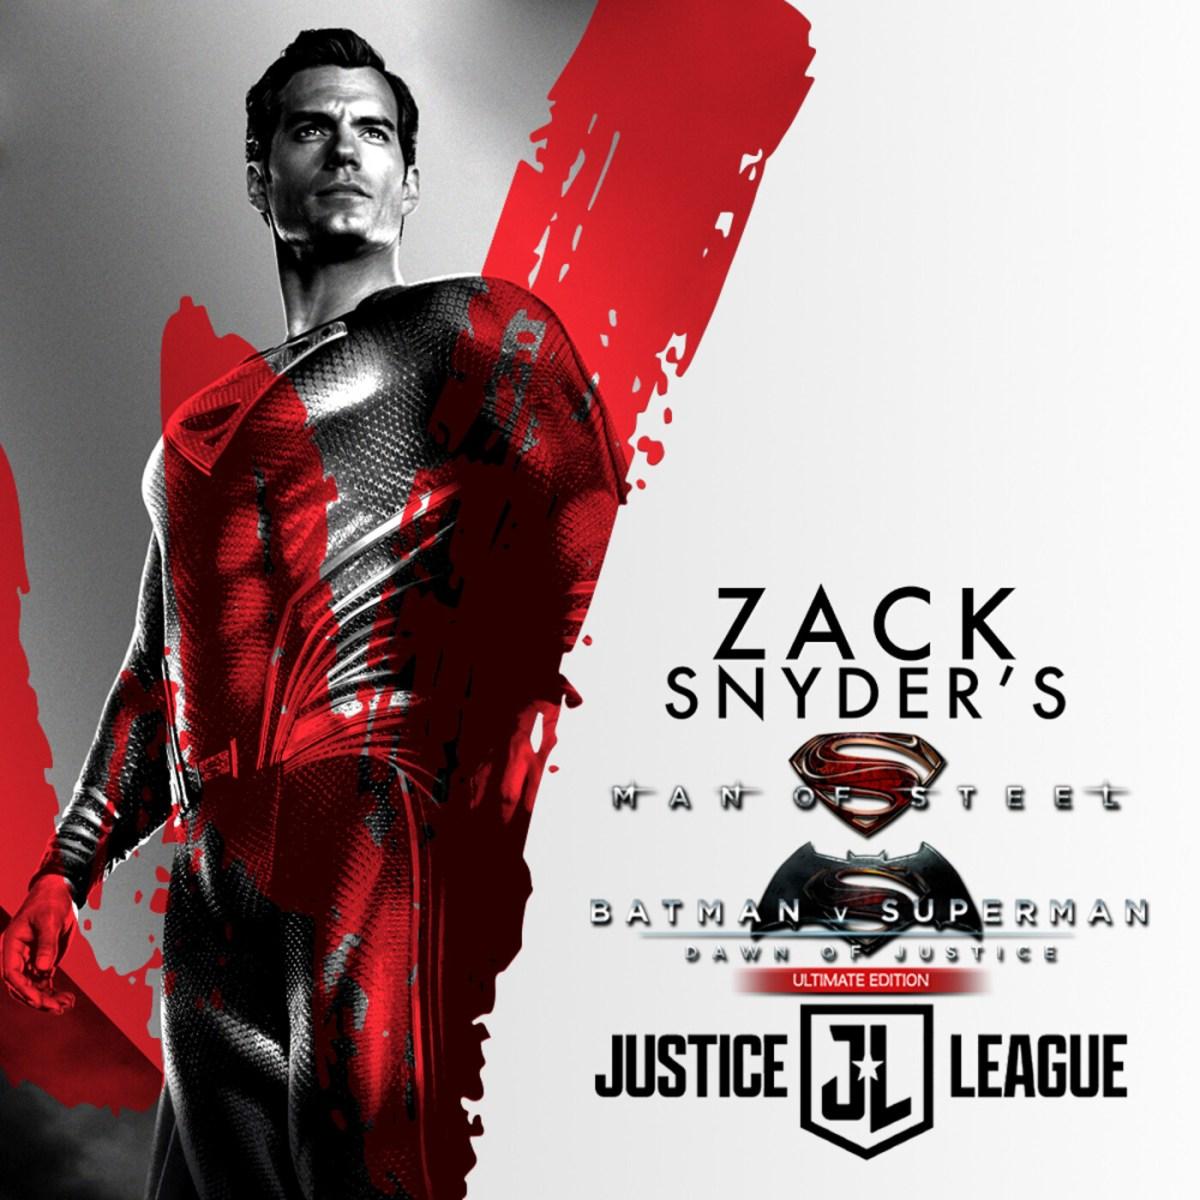 SUPERMAN / Zack Snyder